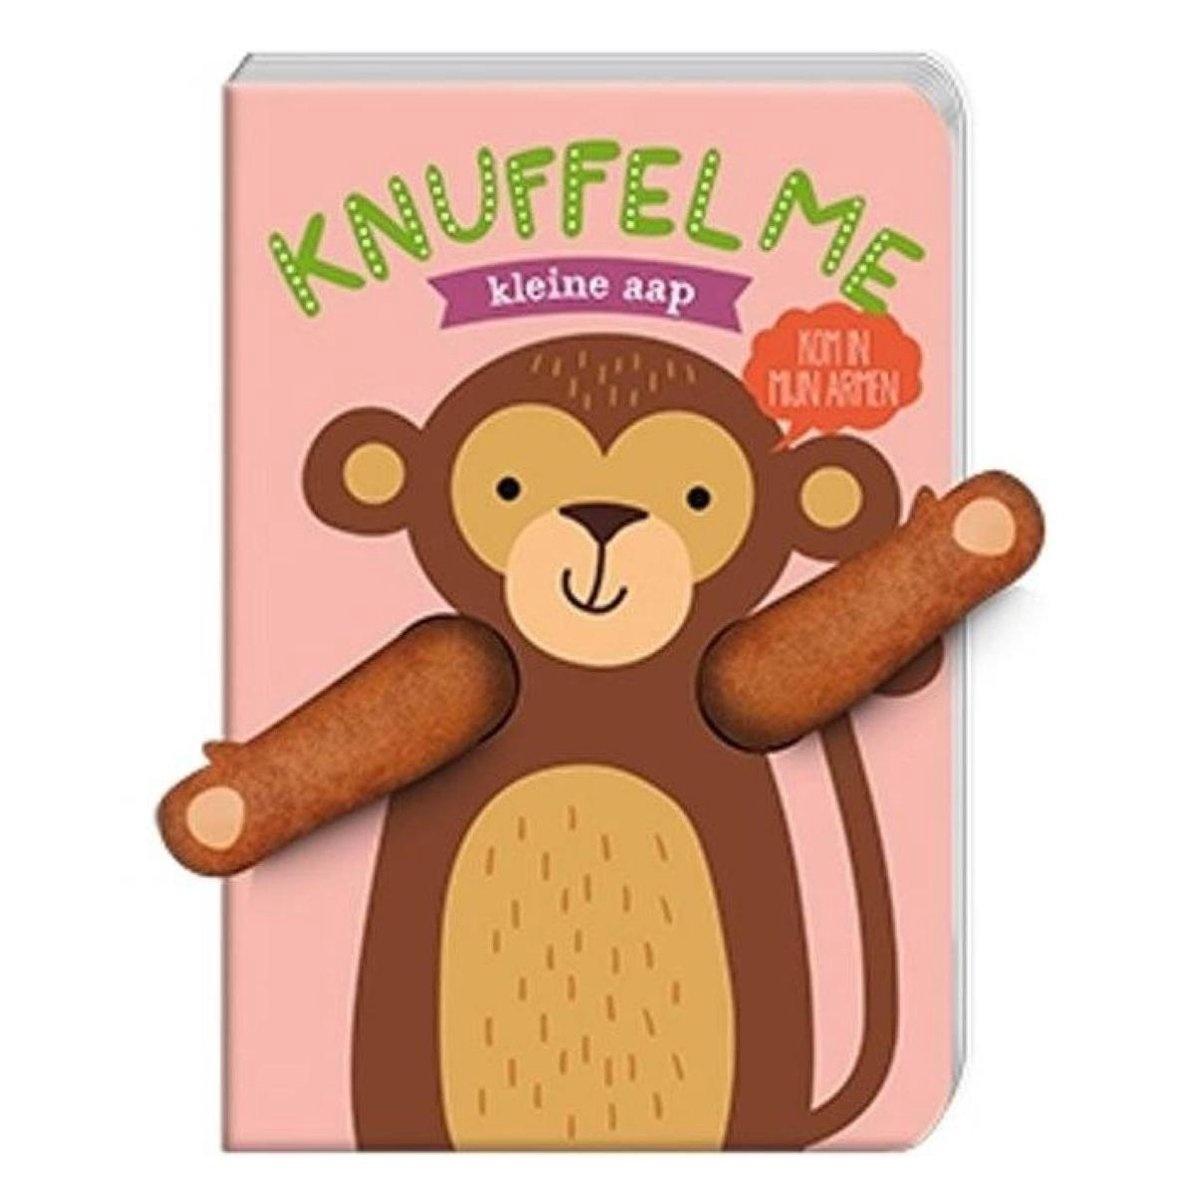 Imagebooks factorie Knuffel me kleine aap